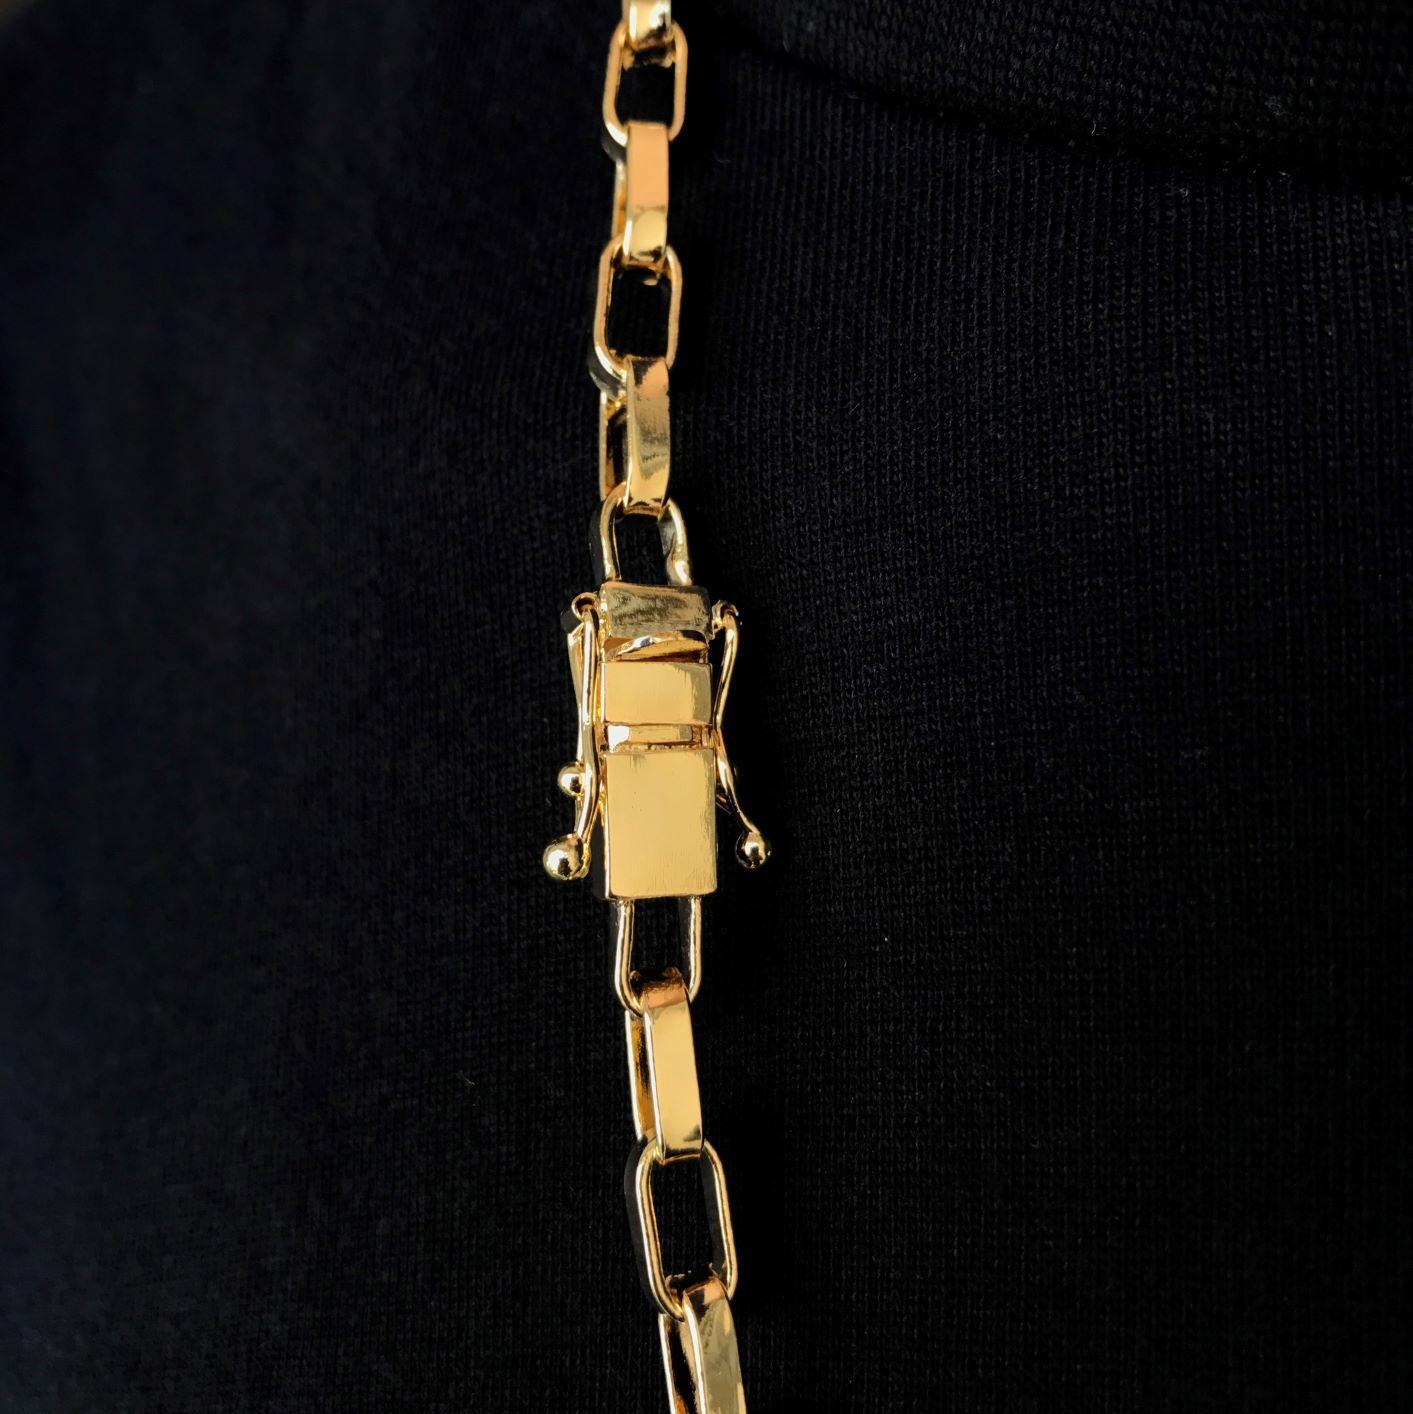 Corrente Carrier Arredondada 5mm 70cm 33g (Fecho Gaveta Duplo) (Banho Ouro 18K)